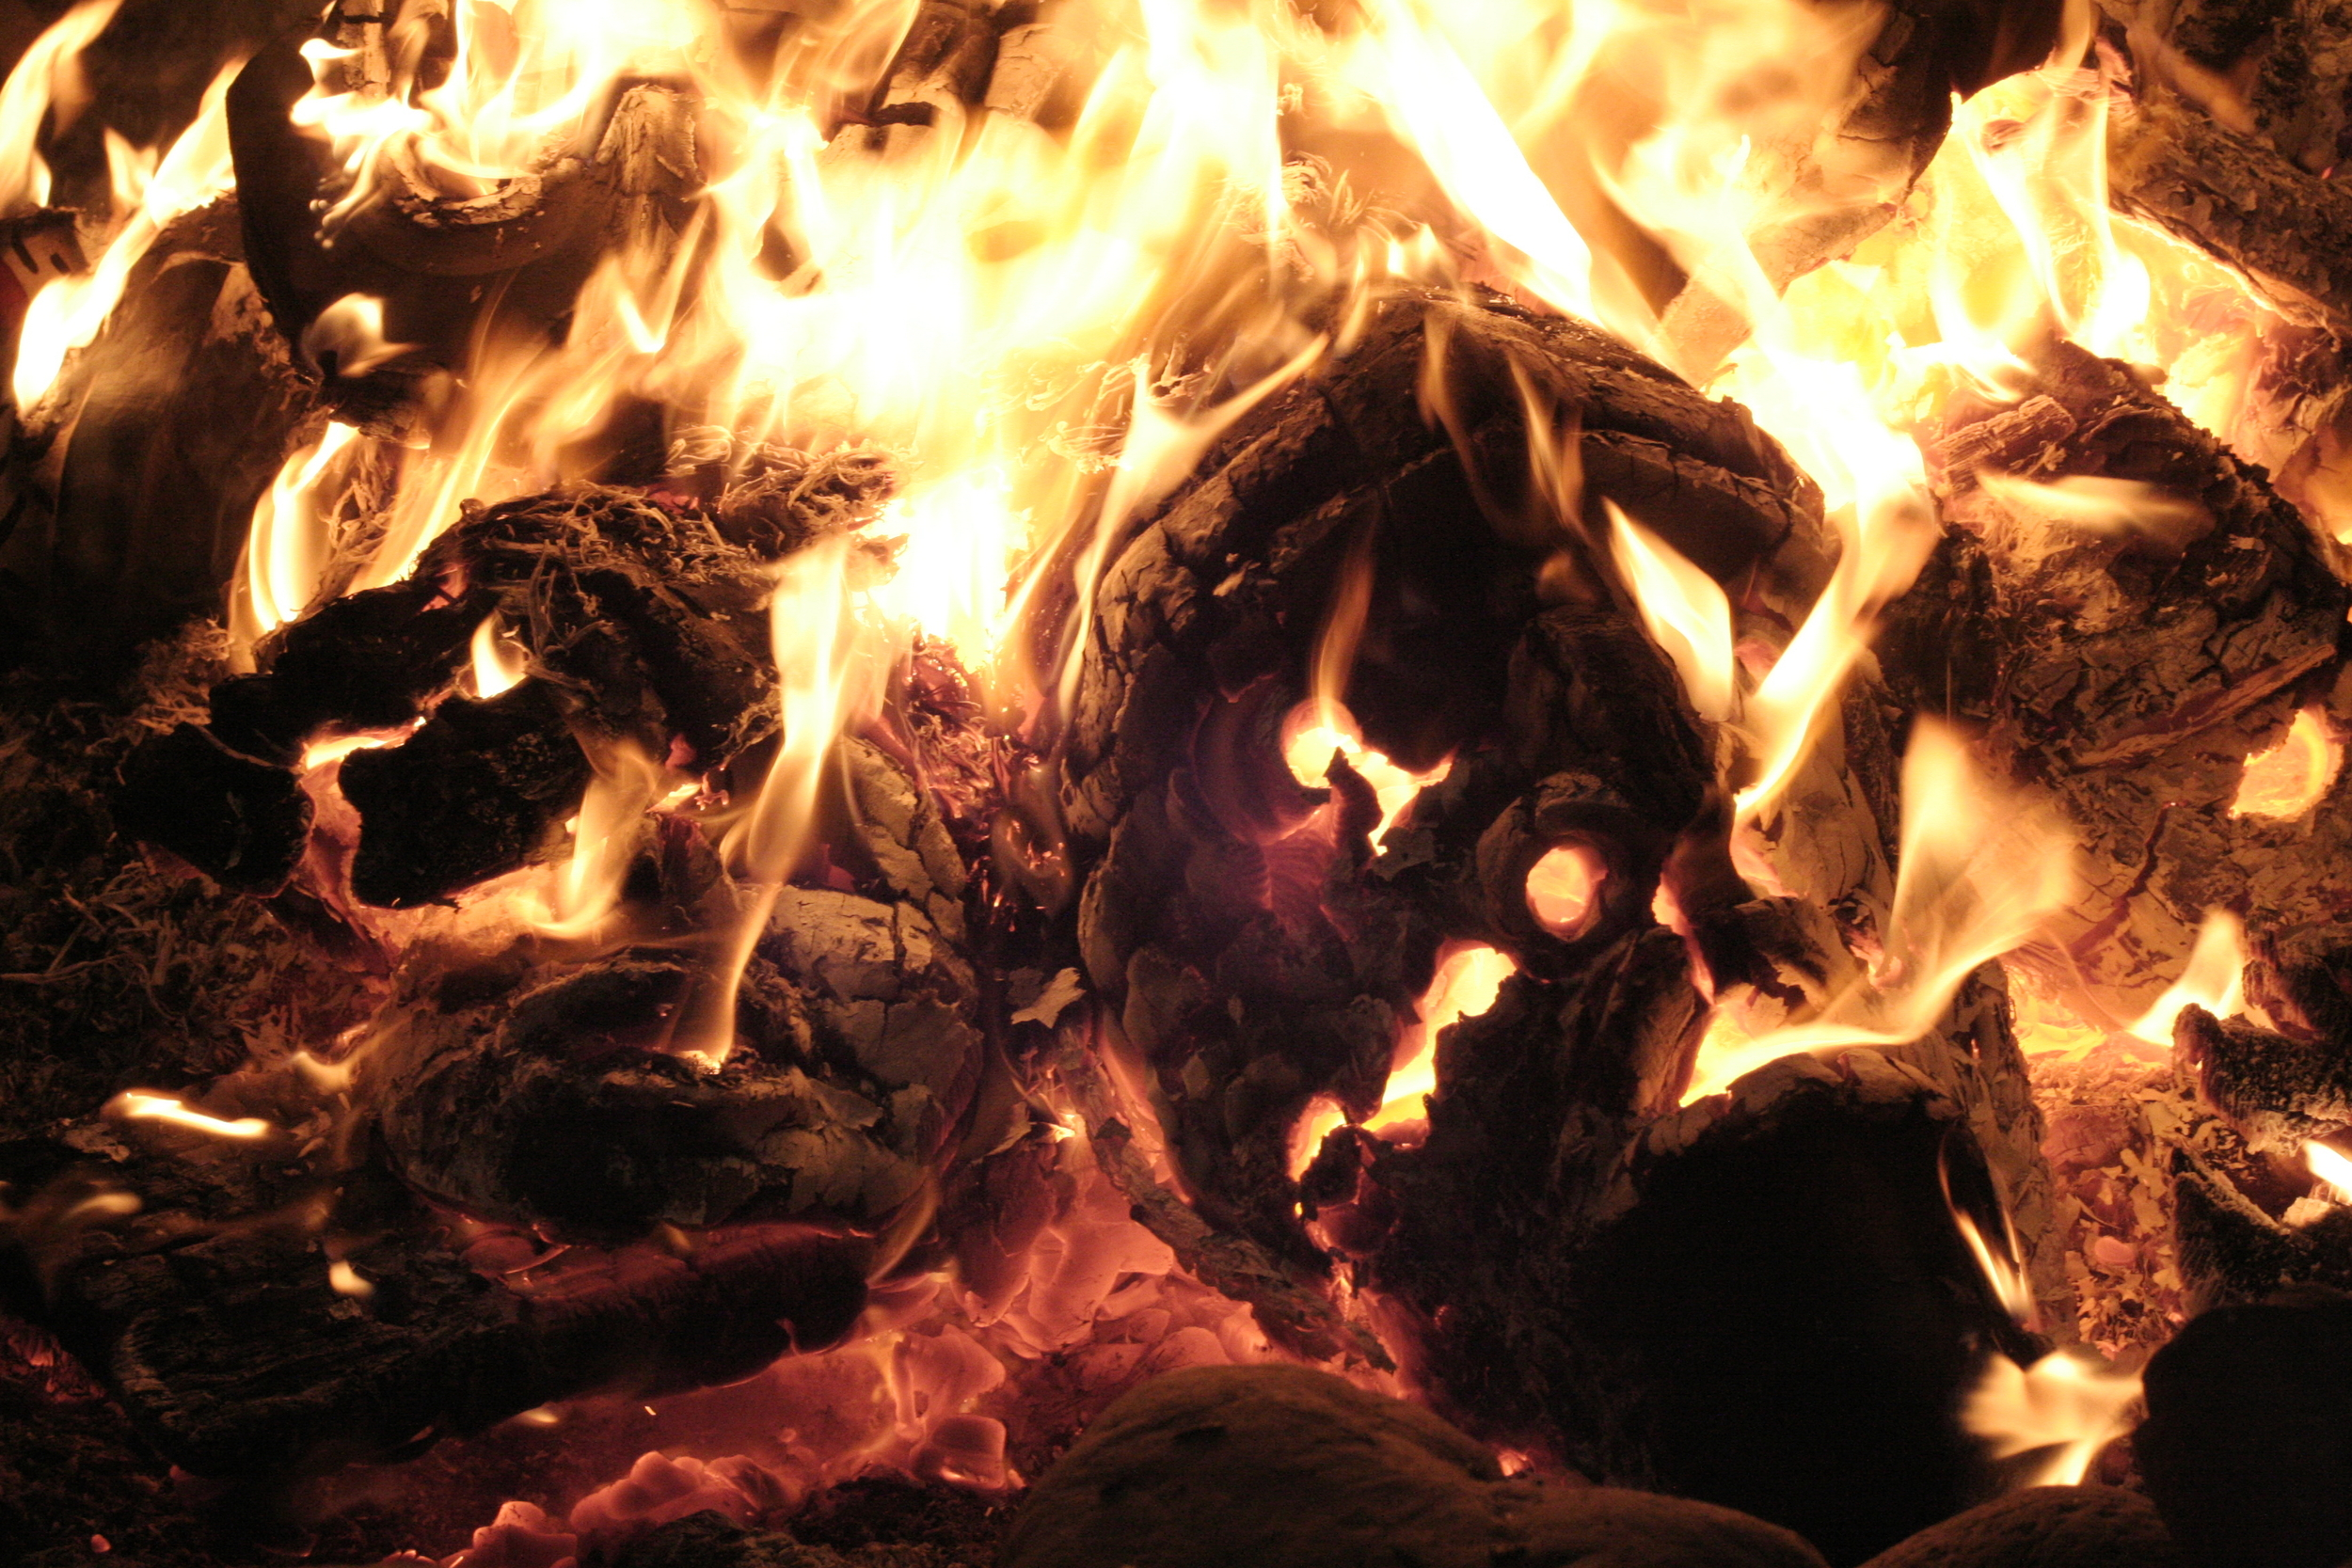 Photo by Steve Calvert from Chief Beau Dick's Potlatch, mask burning ceremony.